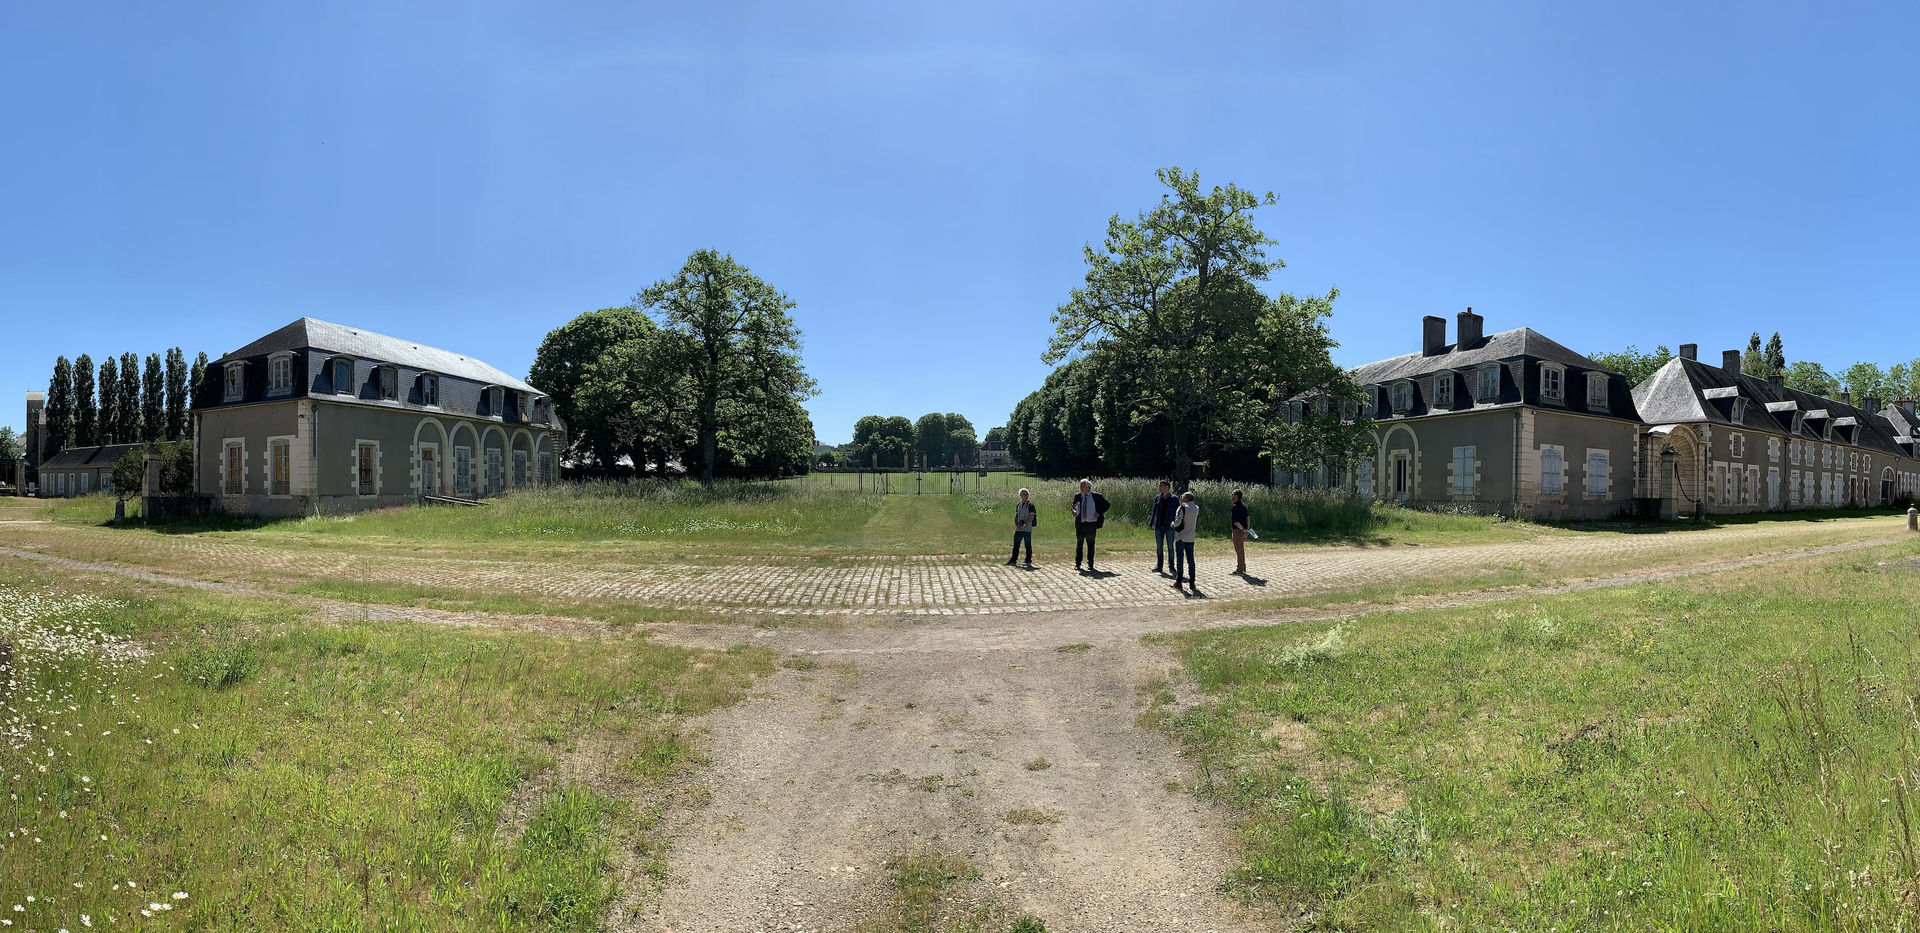 Chateau_22.HEIC